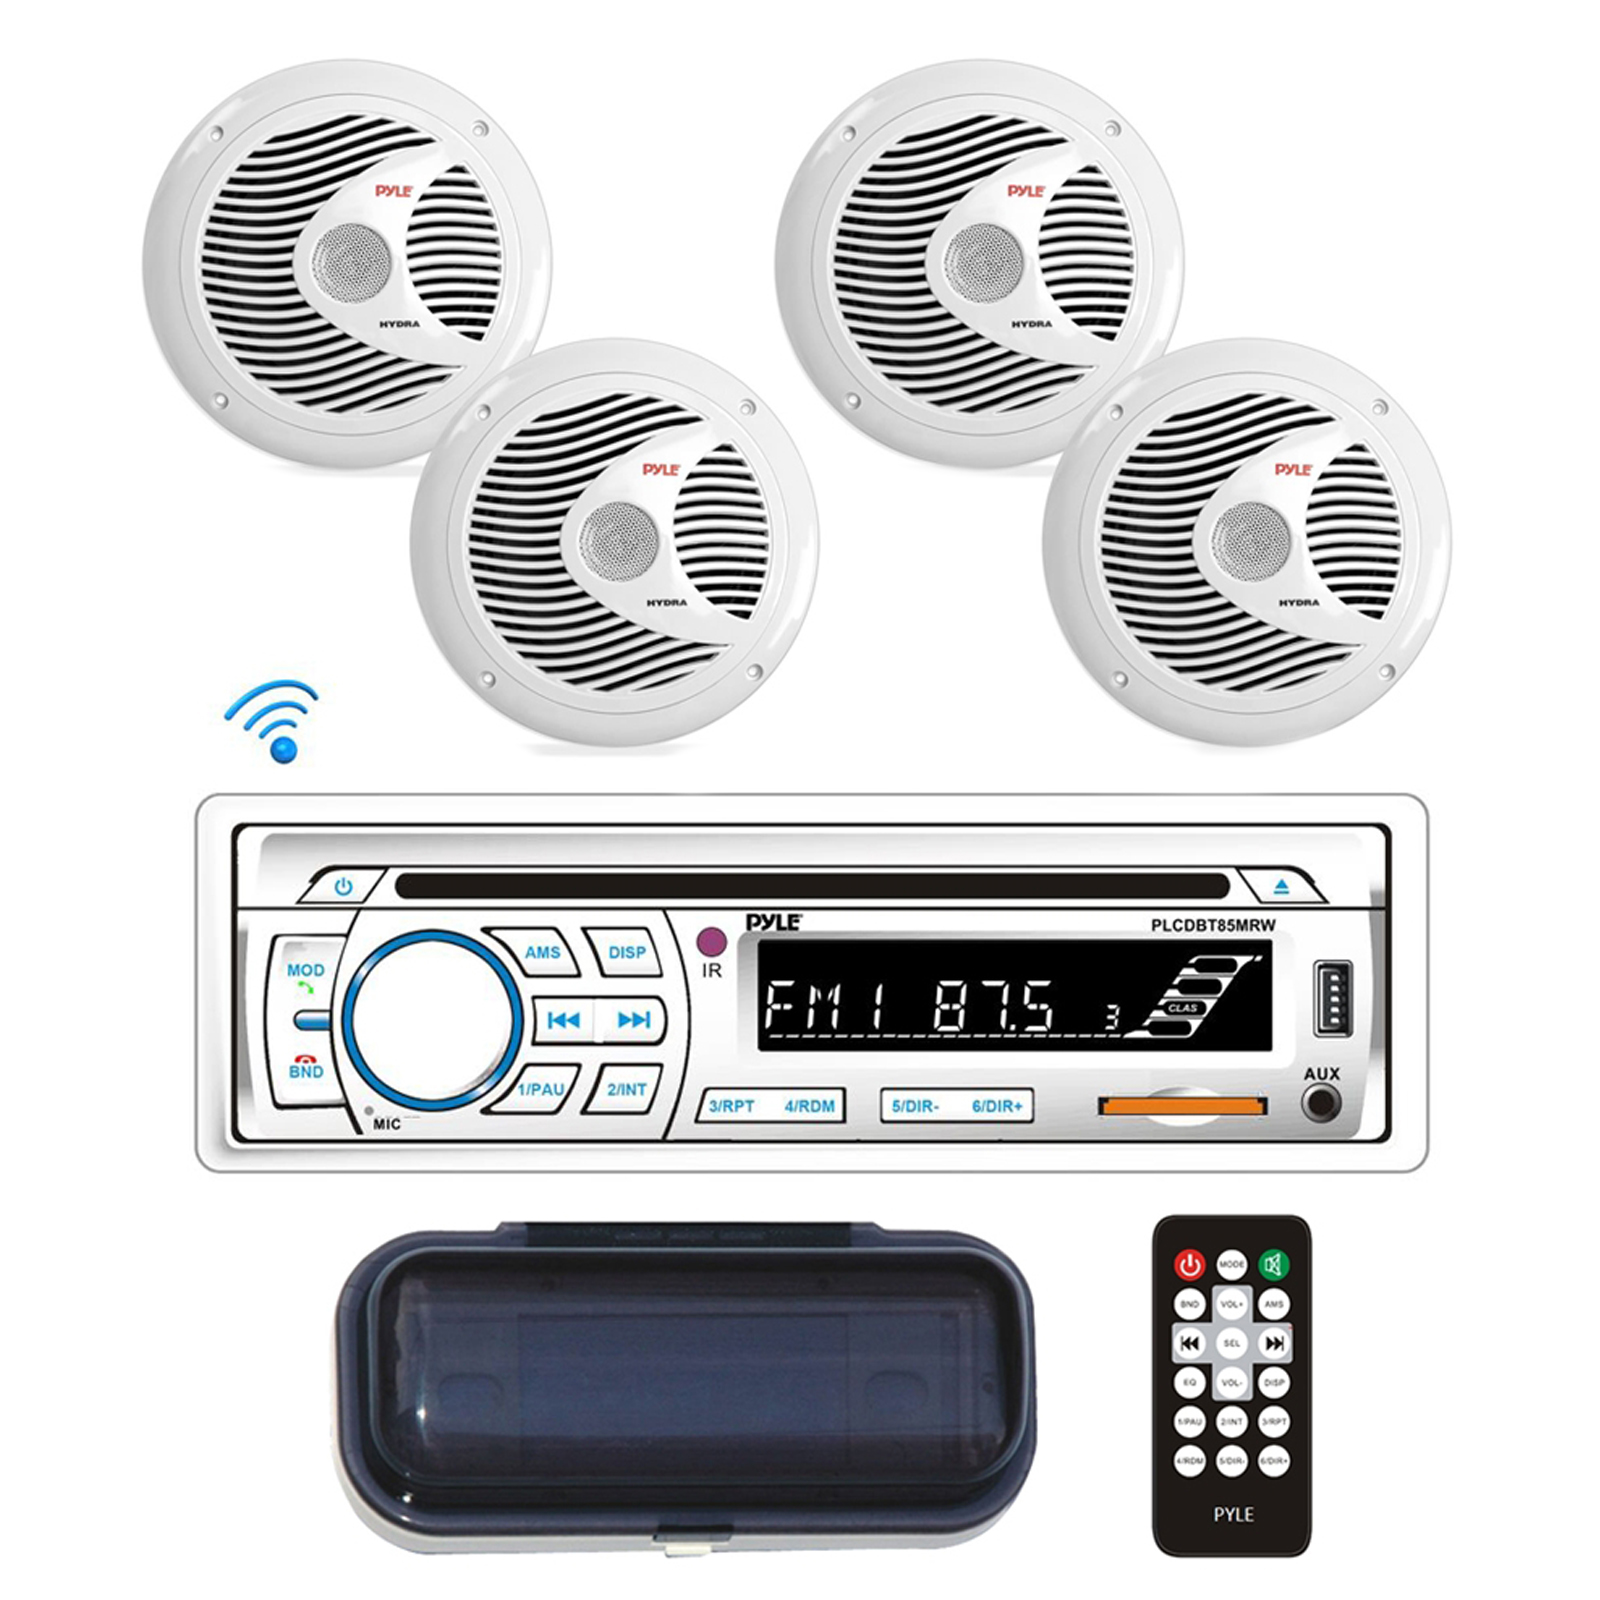 "BT Marine Stereo Radio Receiver & Waterproof Speaker Kit, Hands-Free Talking, CD Player, MP3/USB/SD Readers, AM/FM Radio, (4) 6.5"" Speakers"